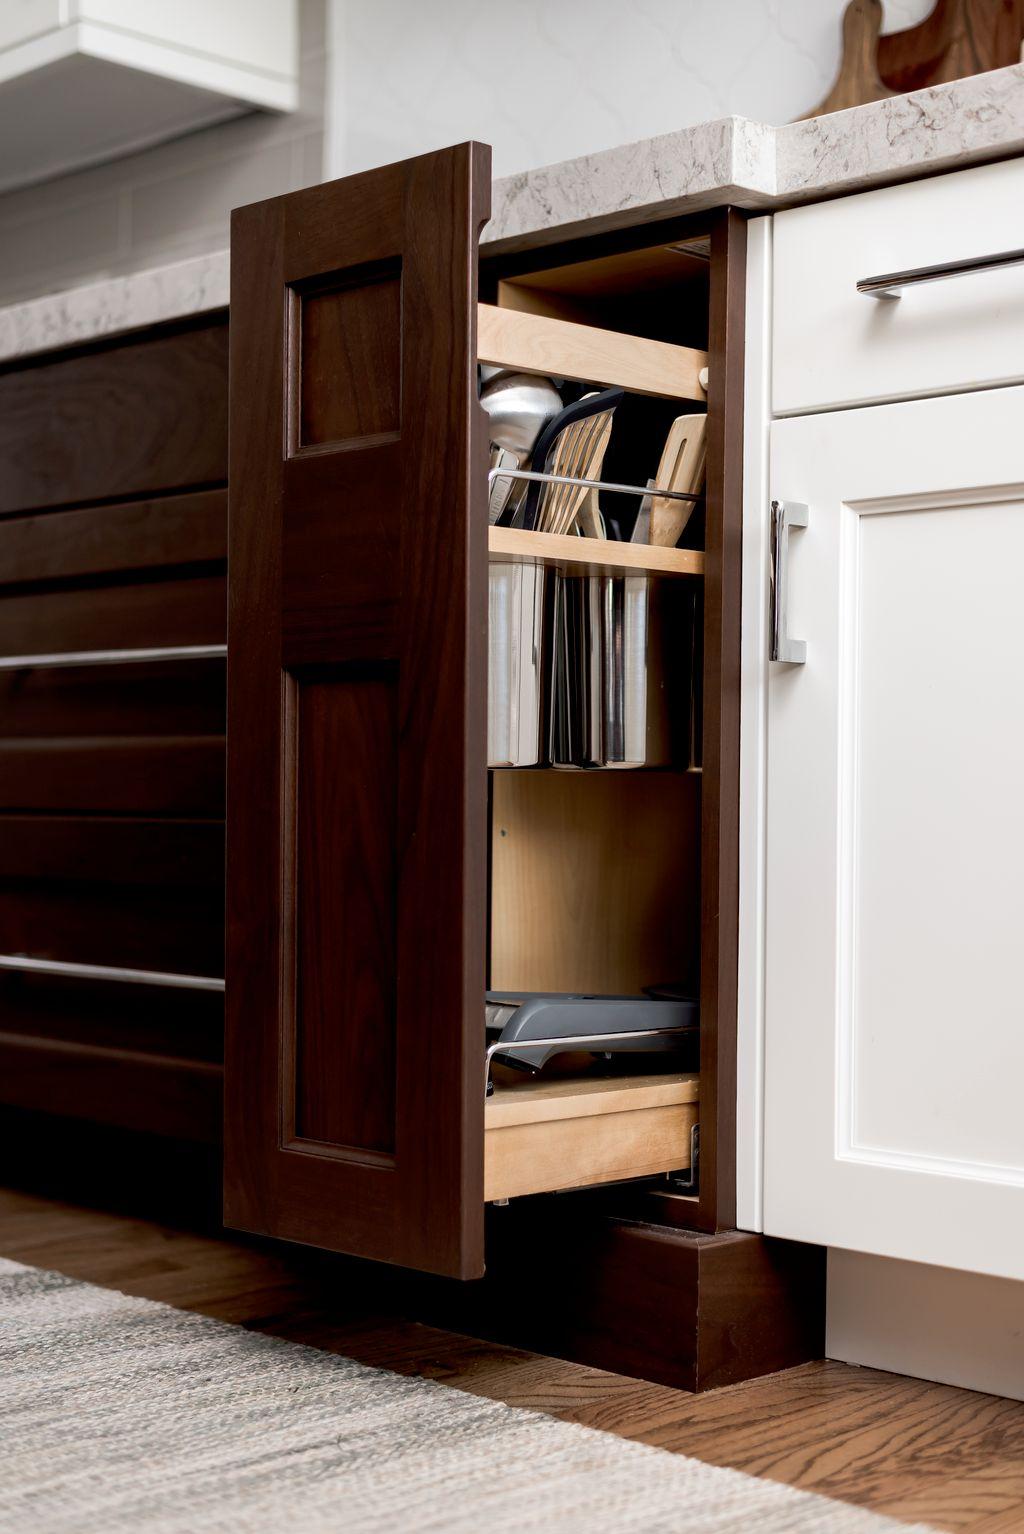 Kitchen remodel for an interior designer